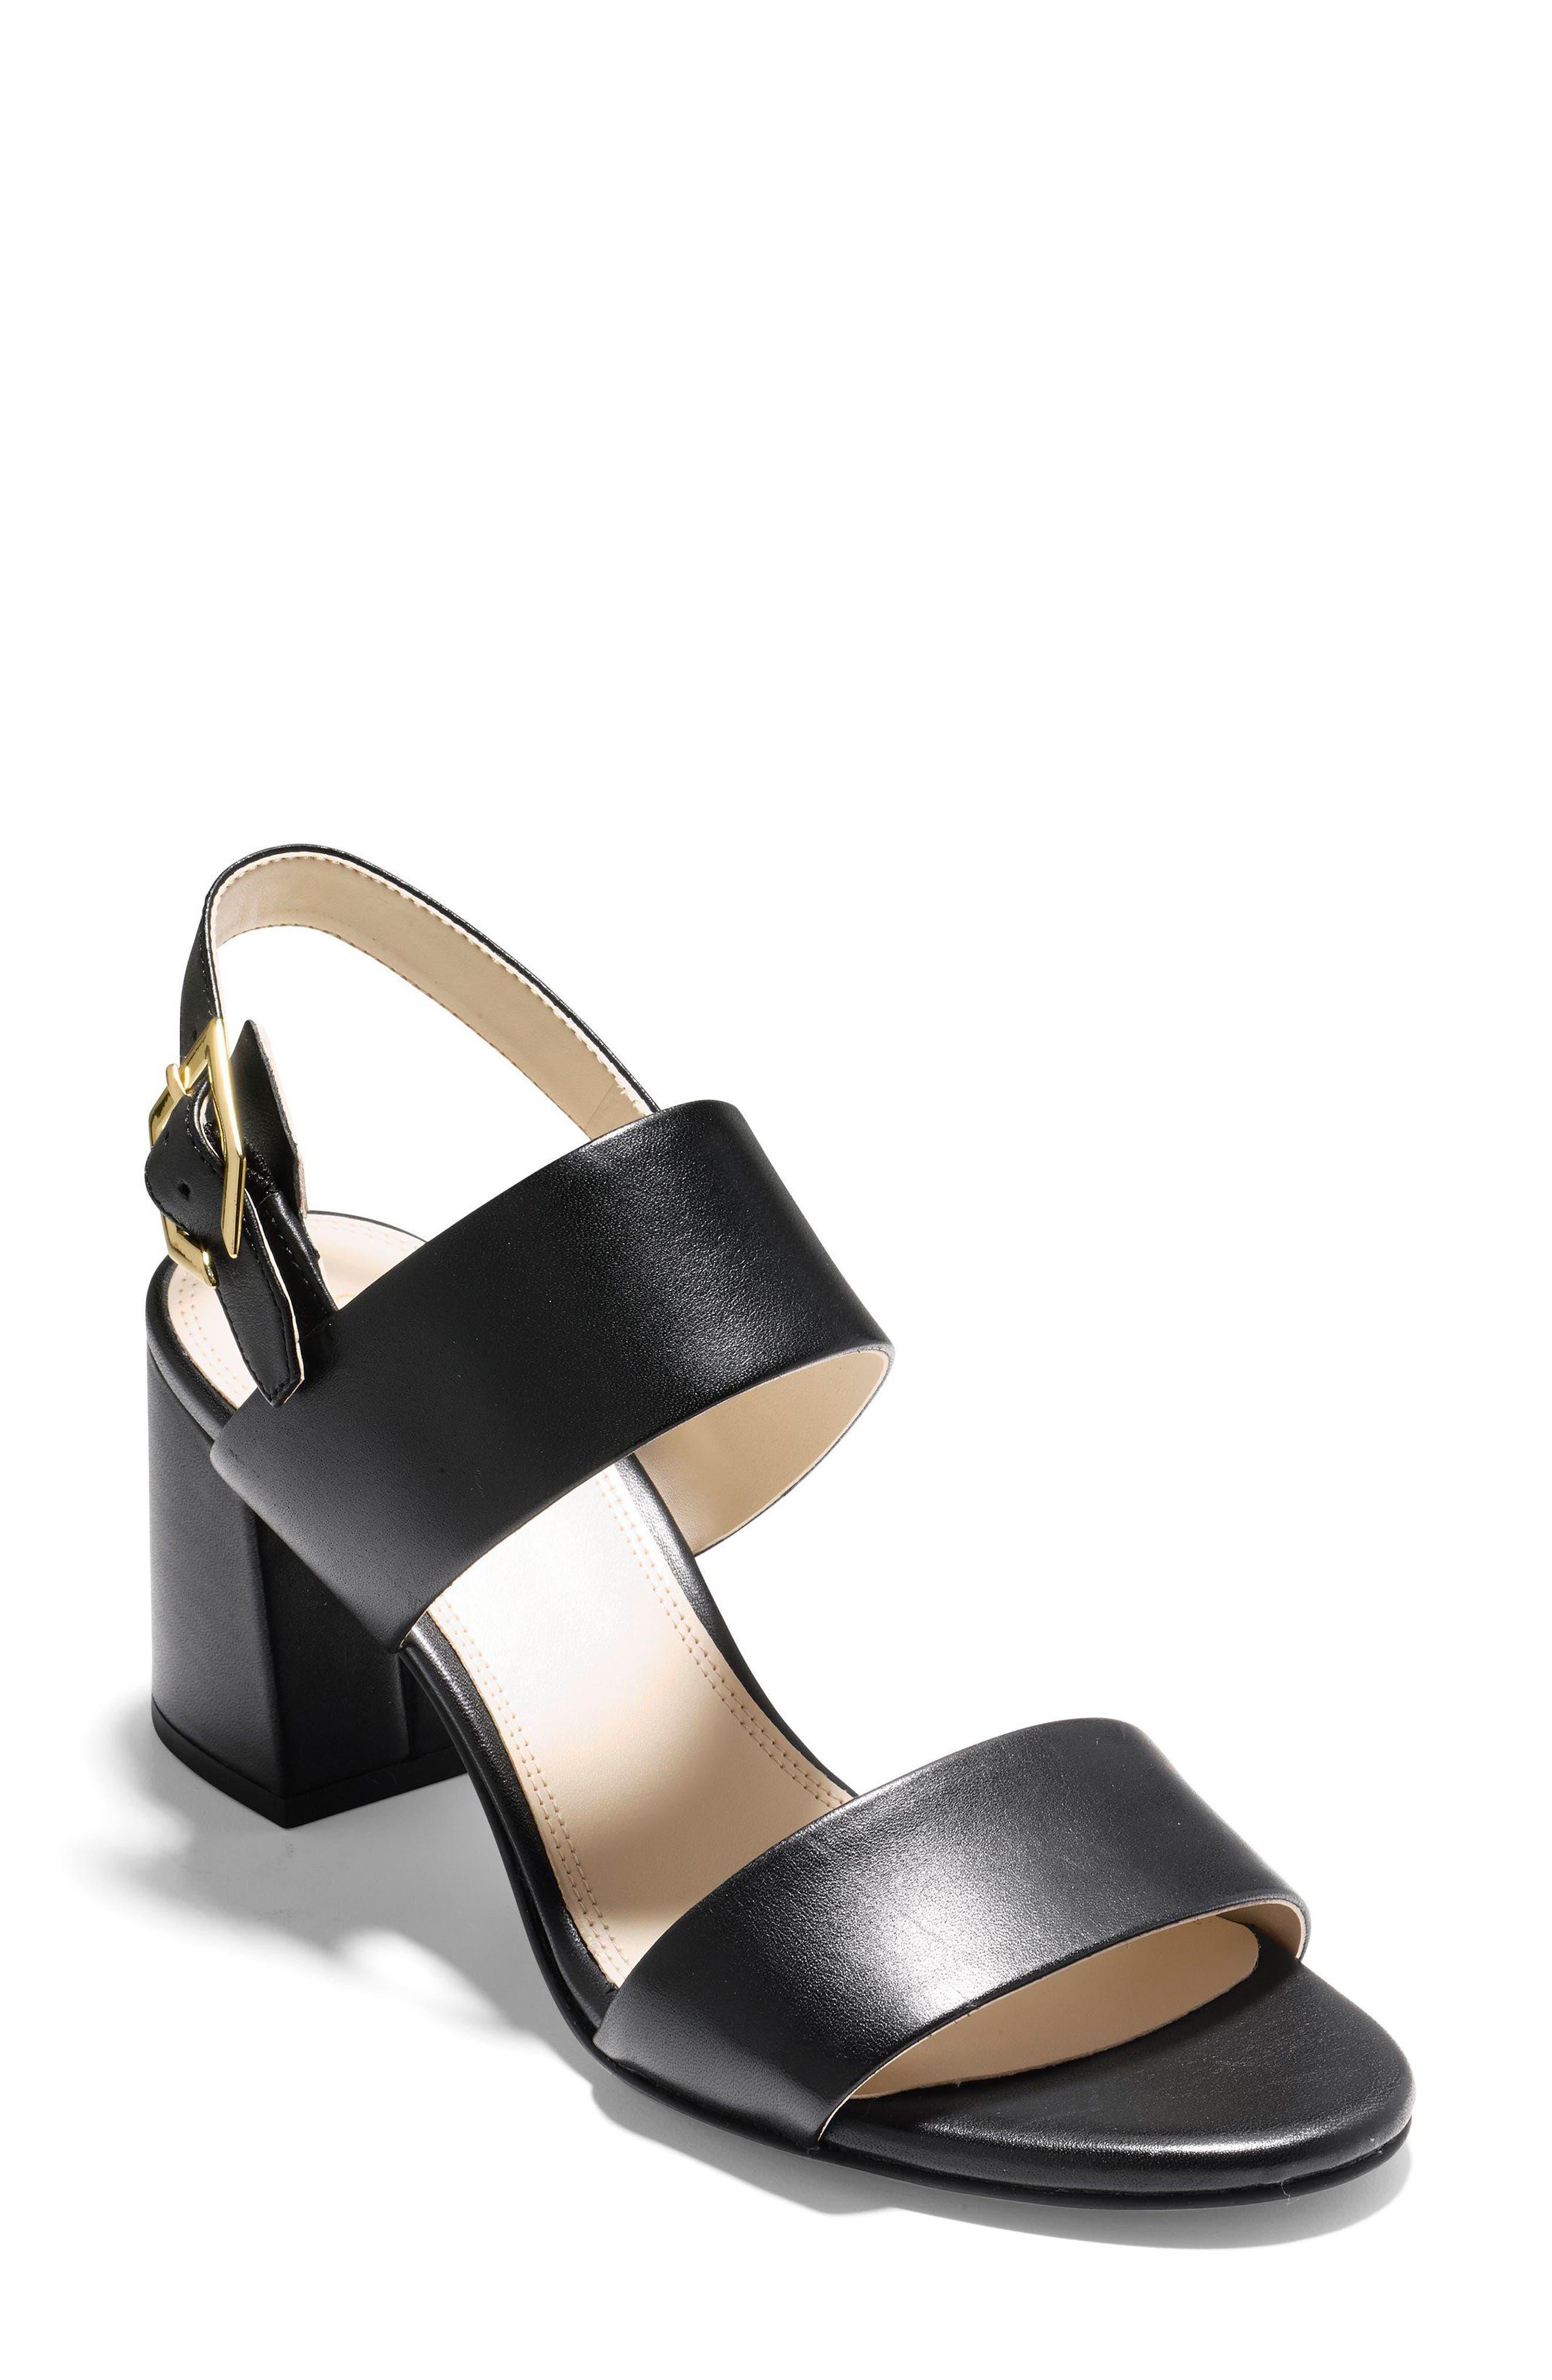 Avani Block Heel Sandal,                         Main,                         color, Black Leather